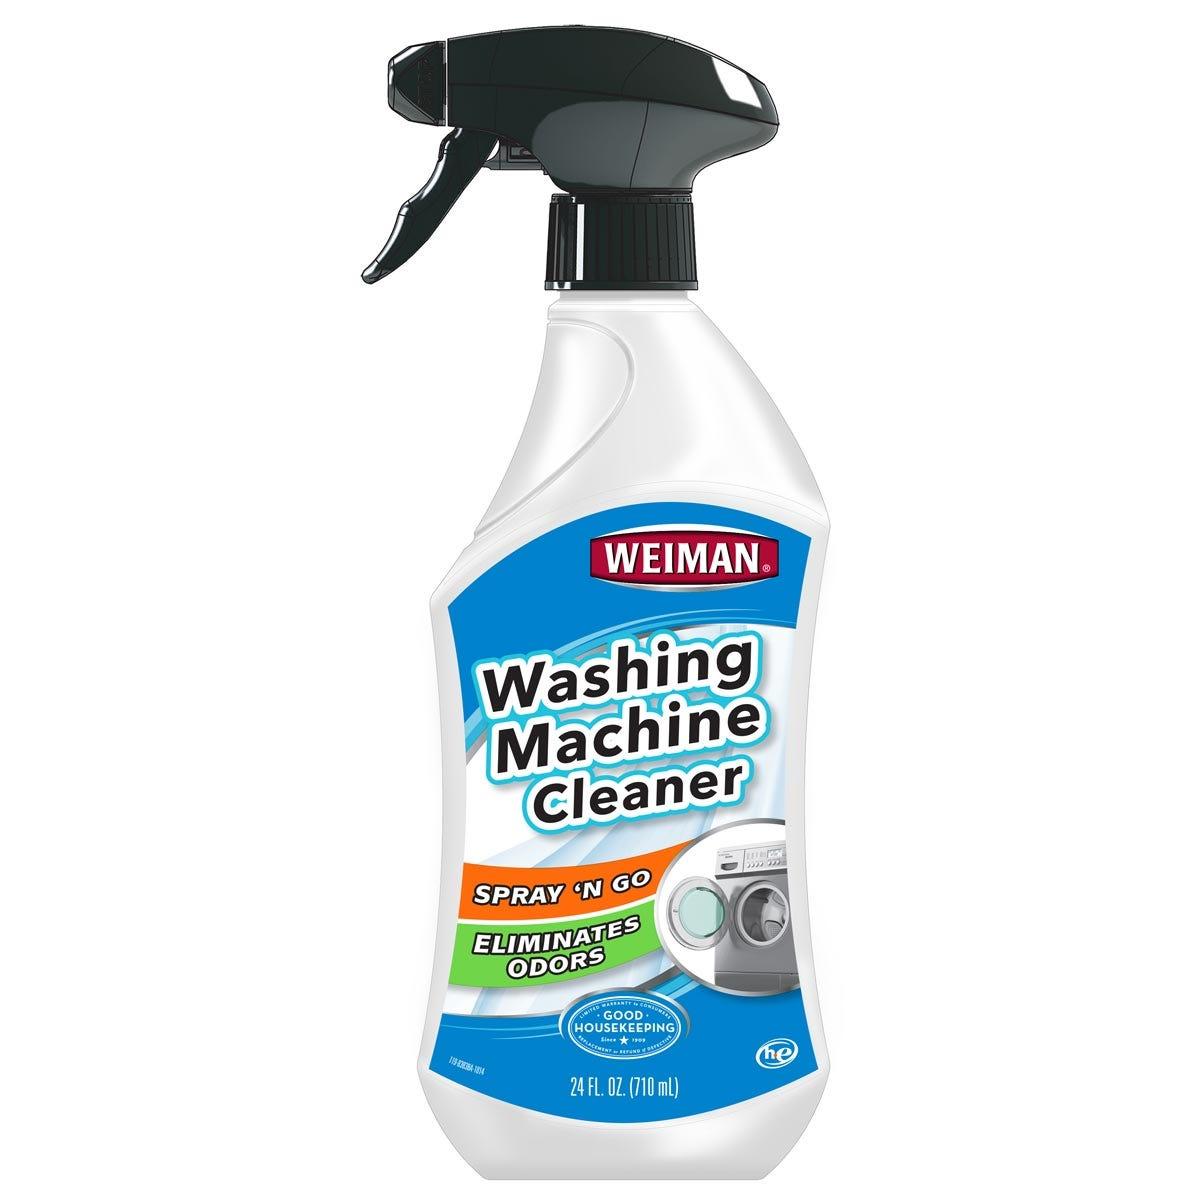 https://googone.com/media/catalog/product/w/a/washing-machine-cleaner.jpg